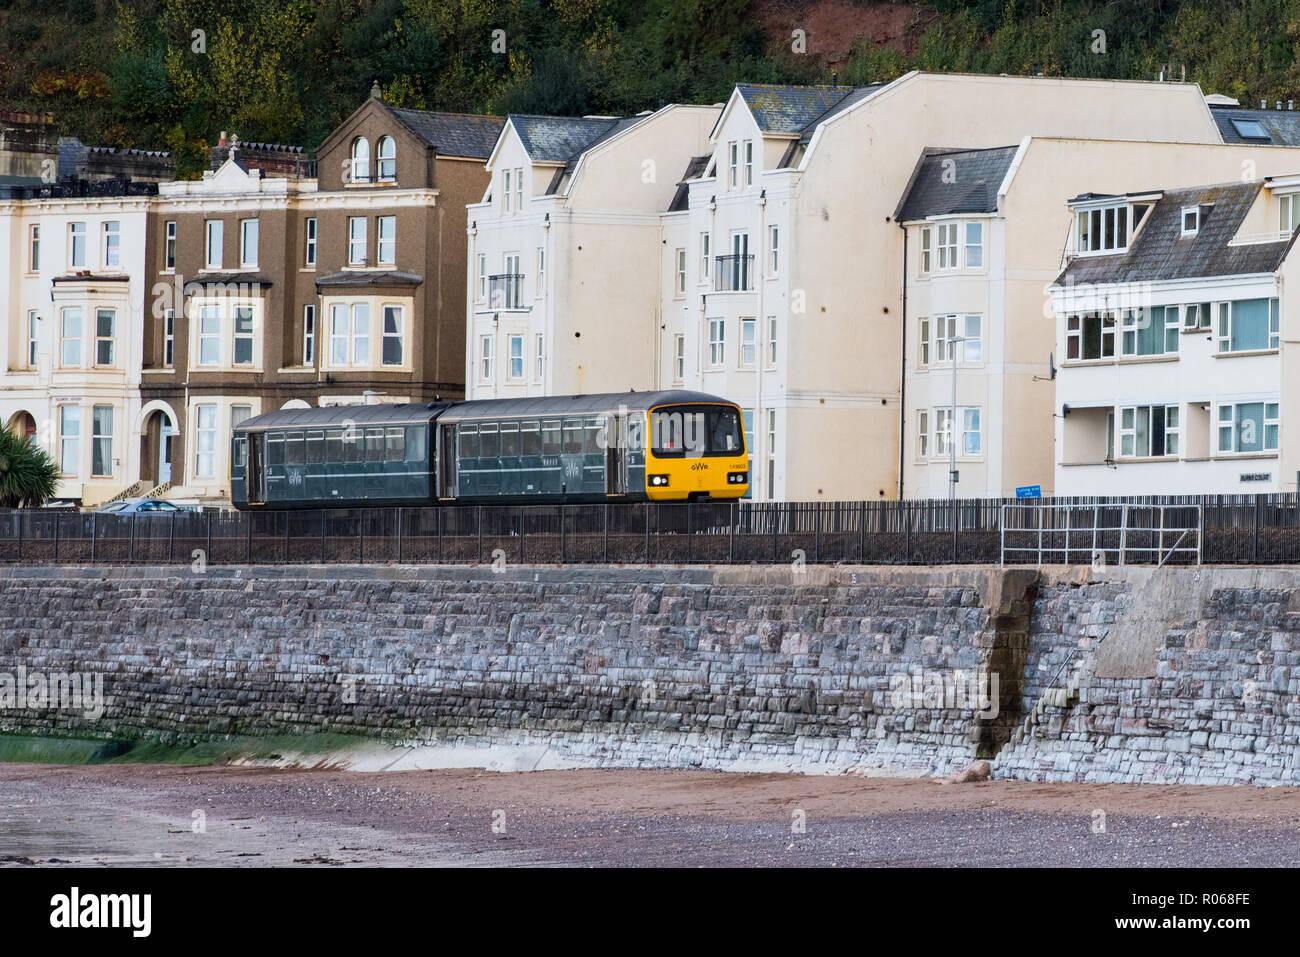 DAWLISH, DEVON, UK - 26OCT2018: GWR Class 143 Pacer Train 143603 South of Dawlish Station. - Stock Image